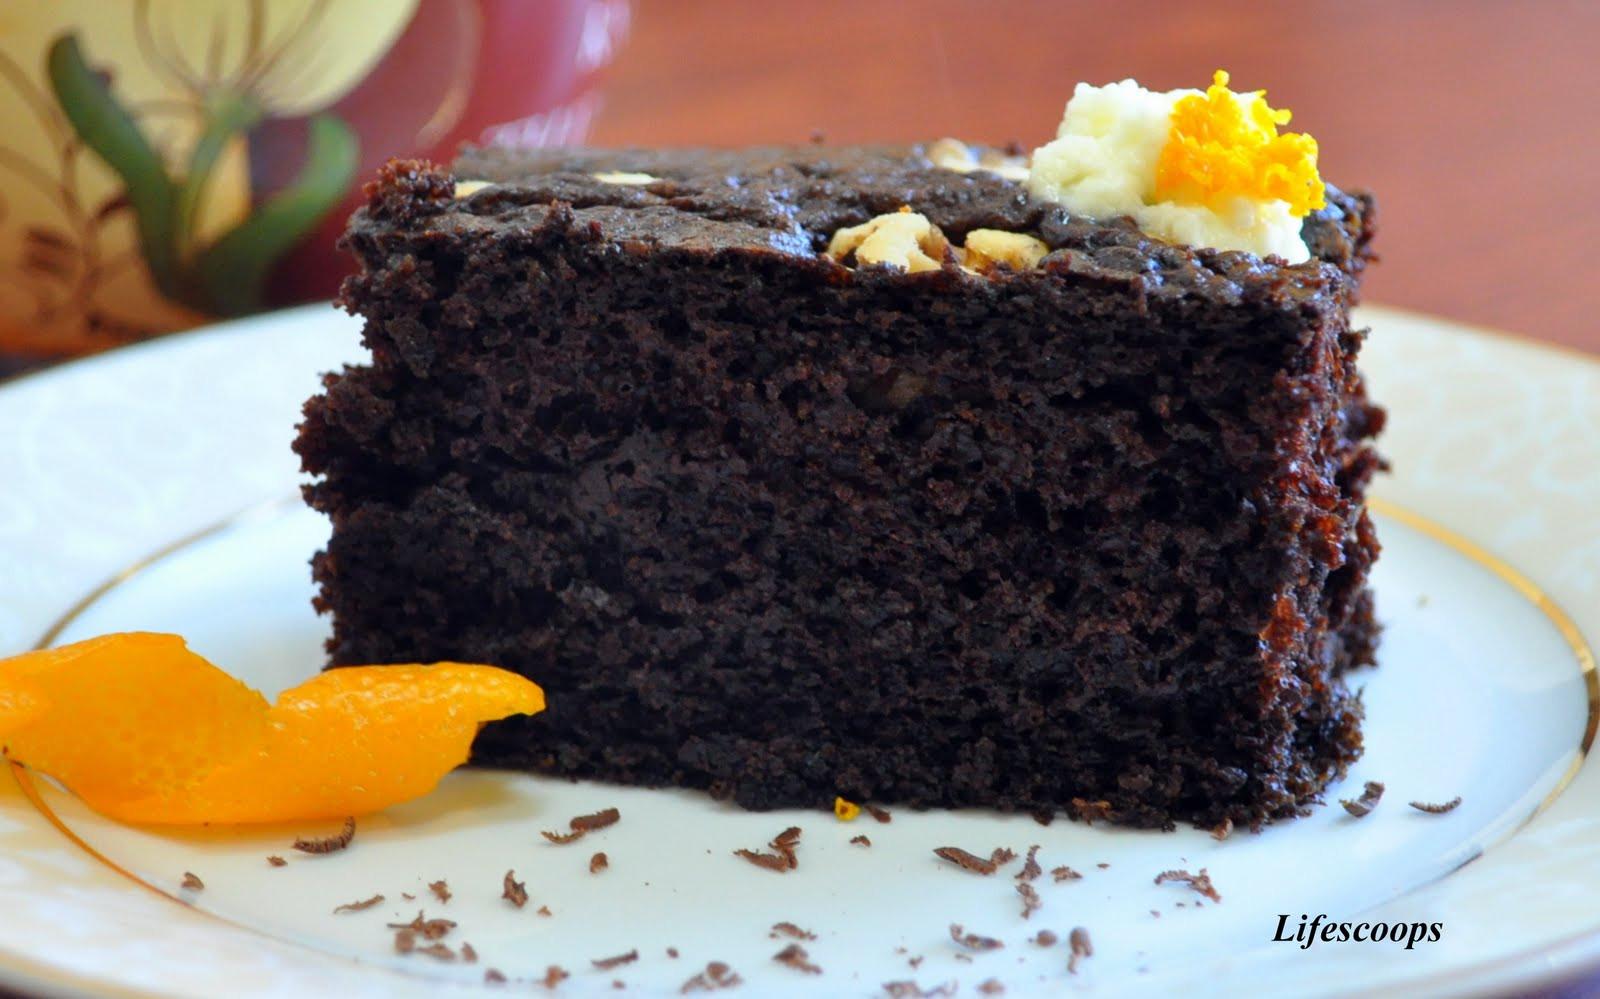 Orange Chocolate Cake  Life Scoops Chocolate Orange Cake